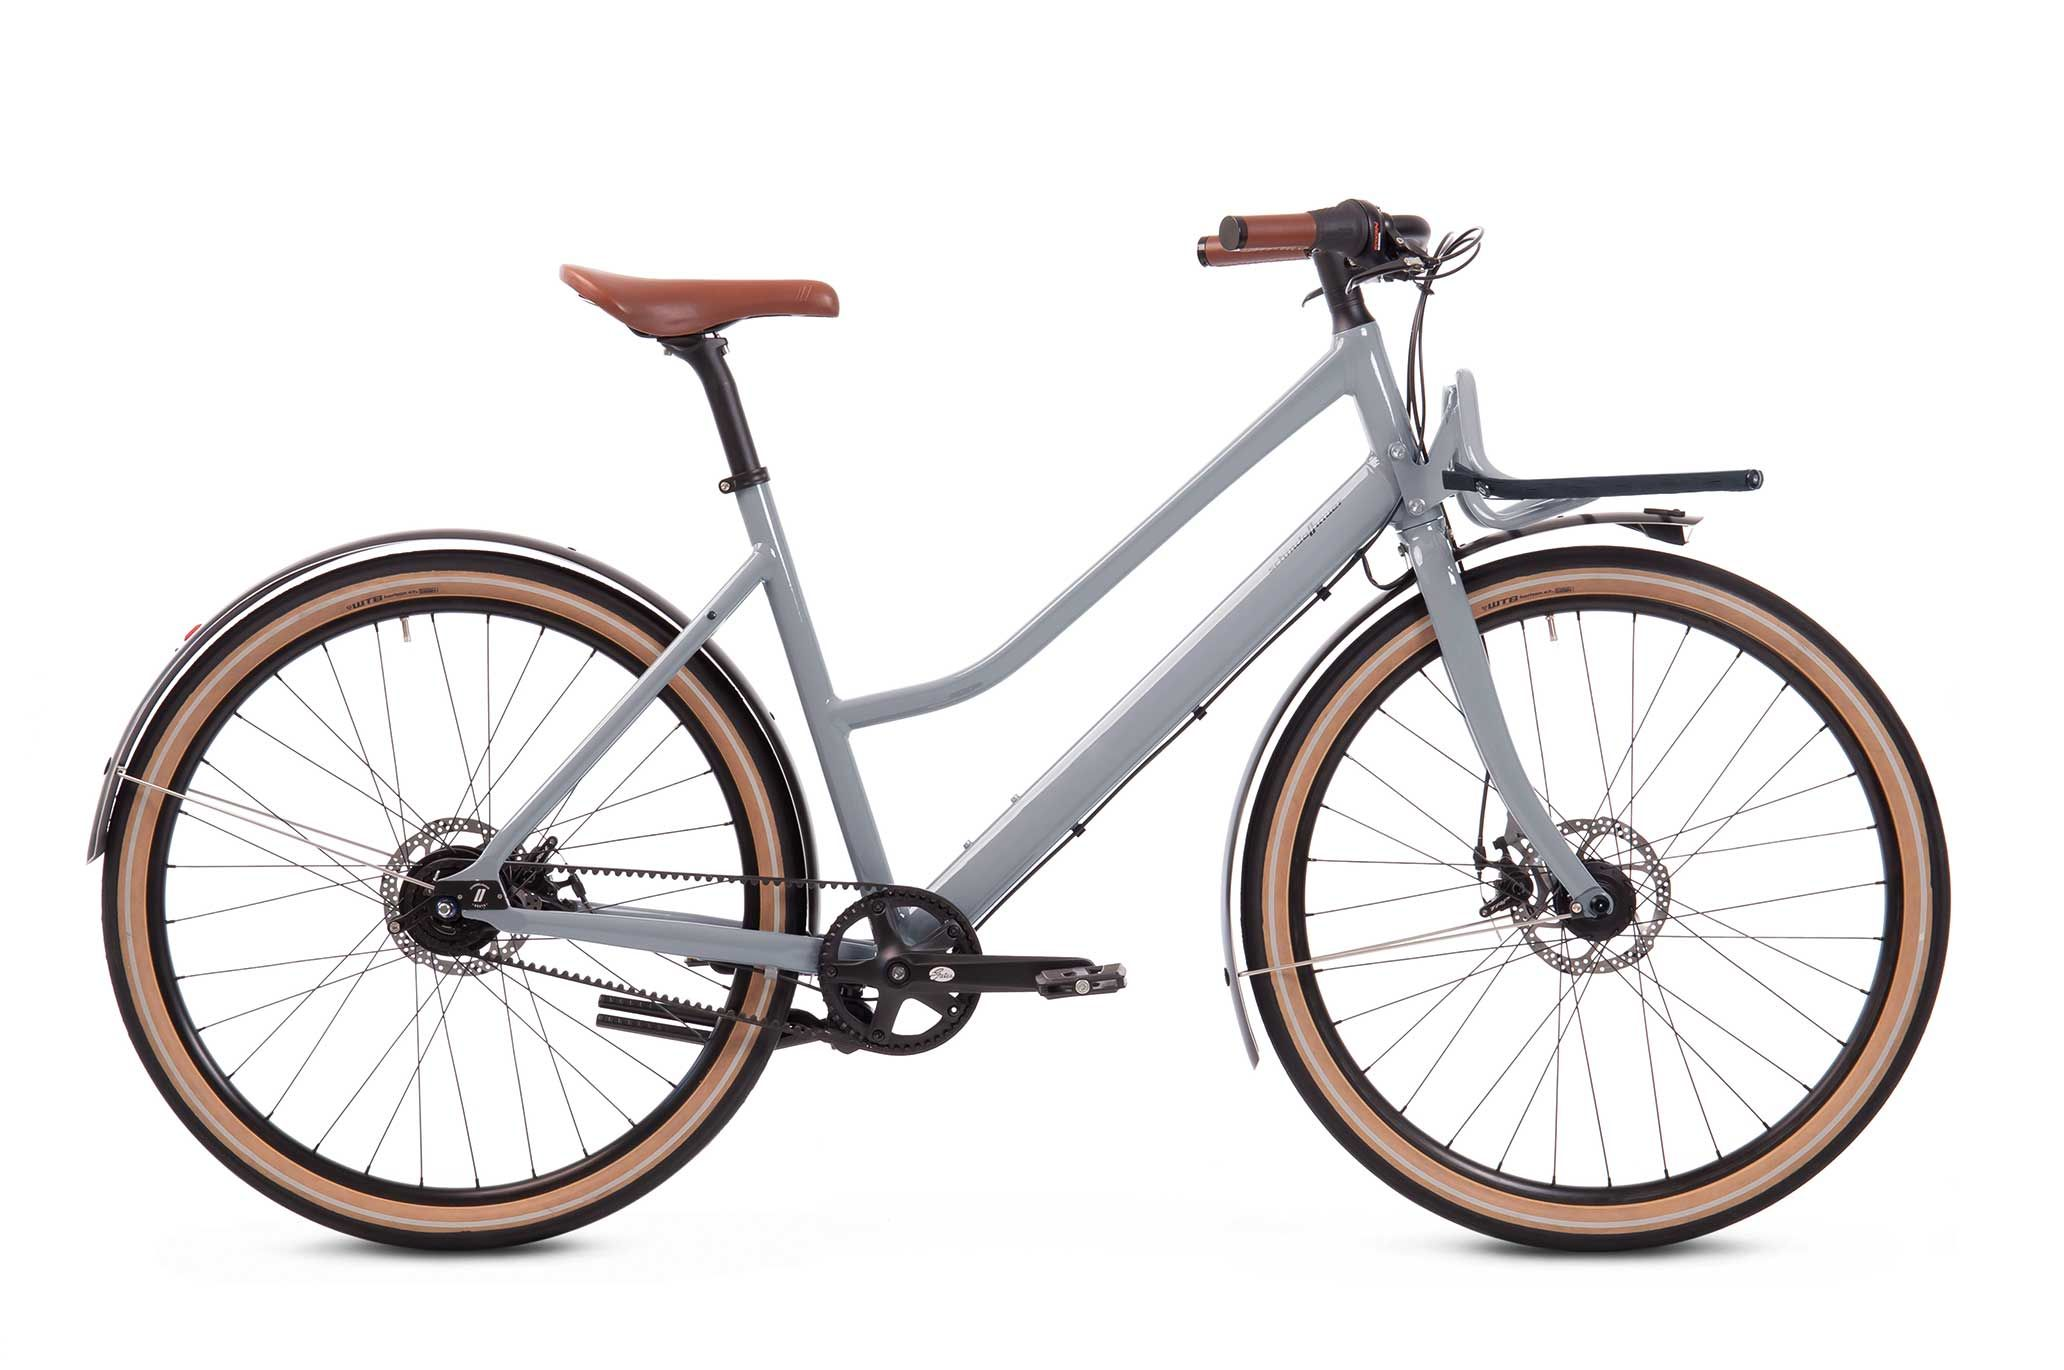 Greta Schindelhauer Bikes Crossbike Fahrrad Fahrradkette